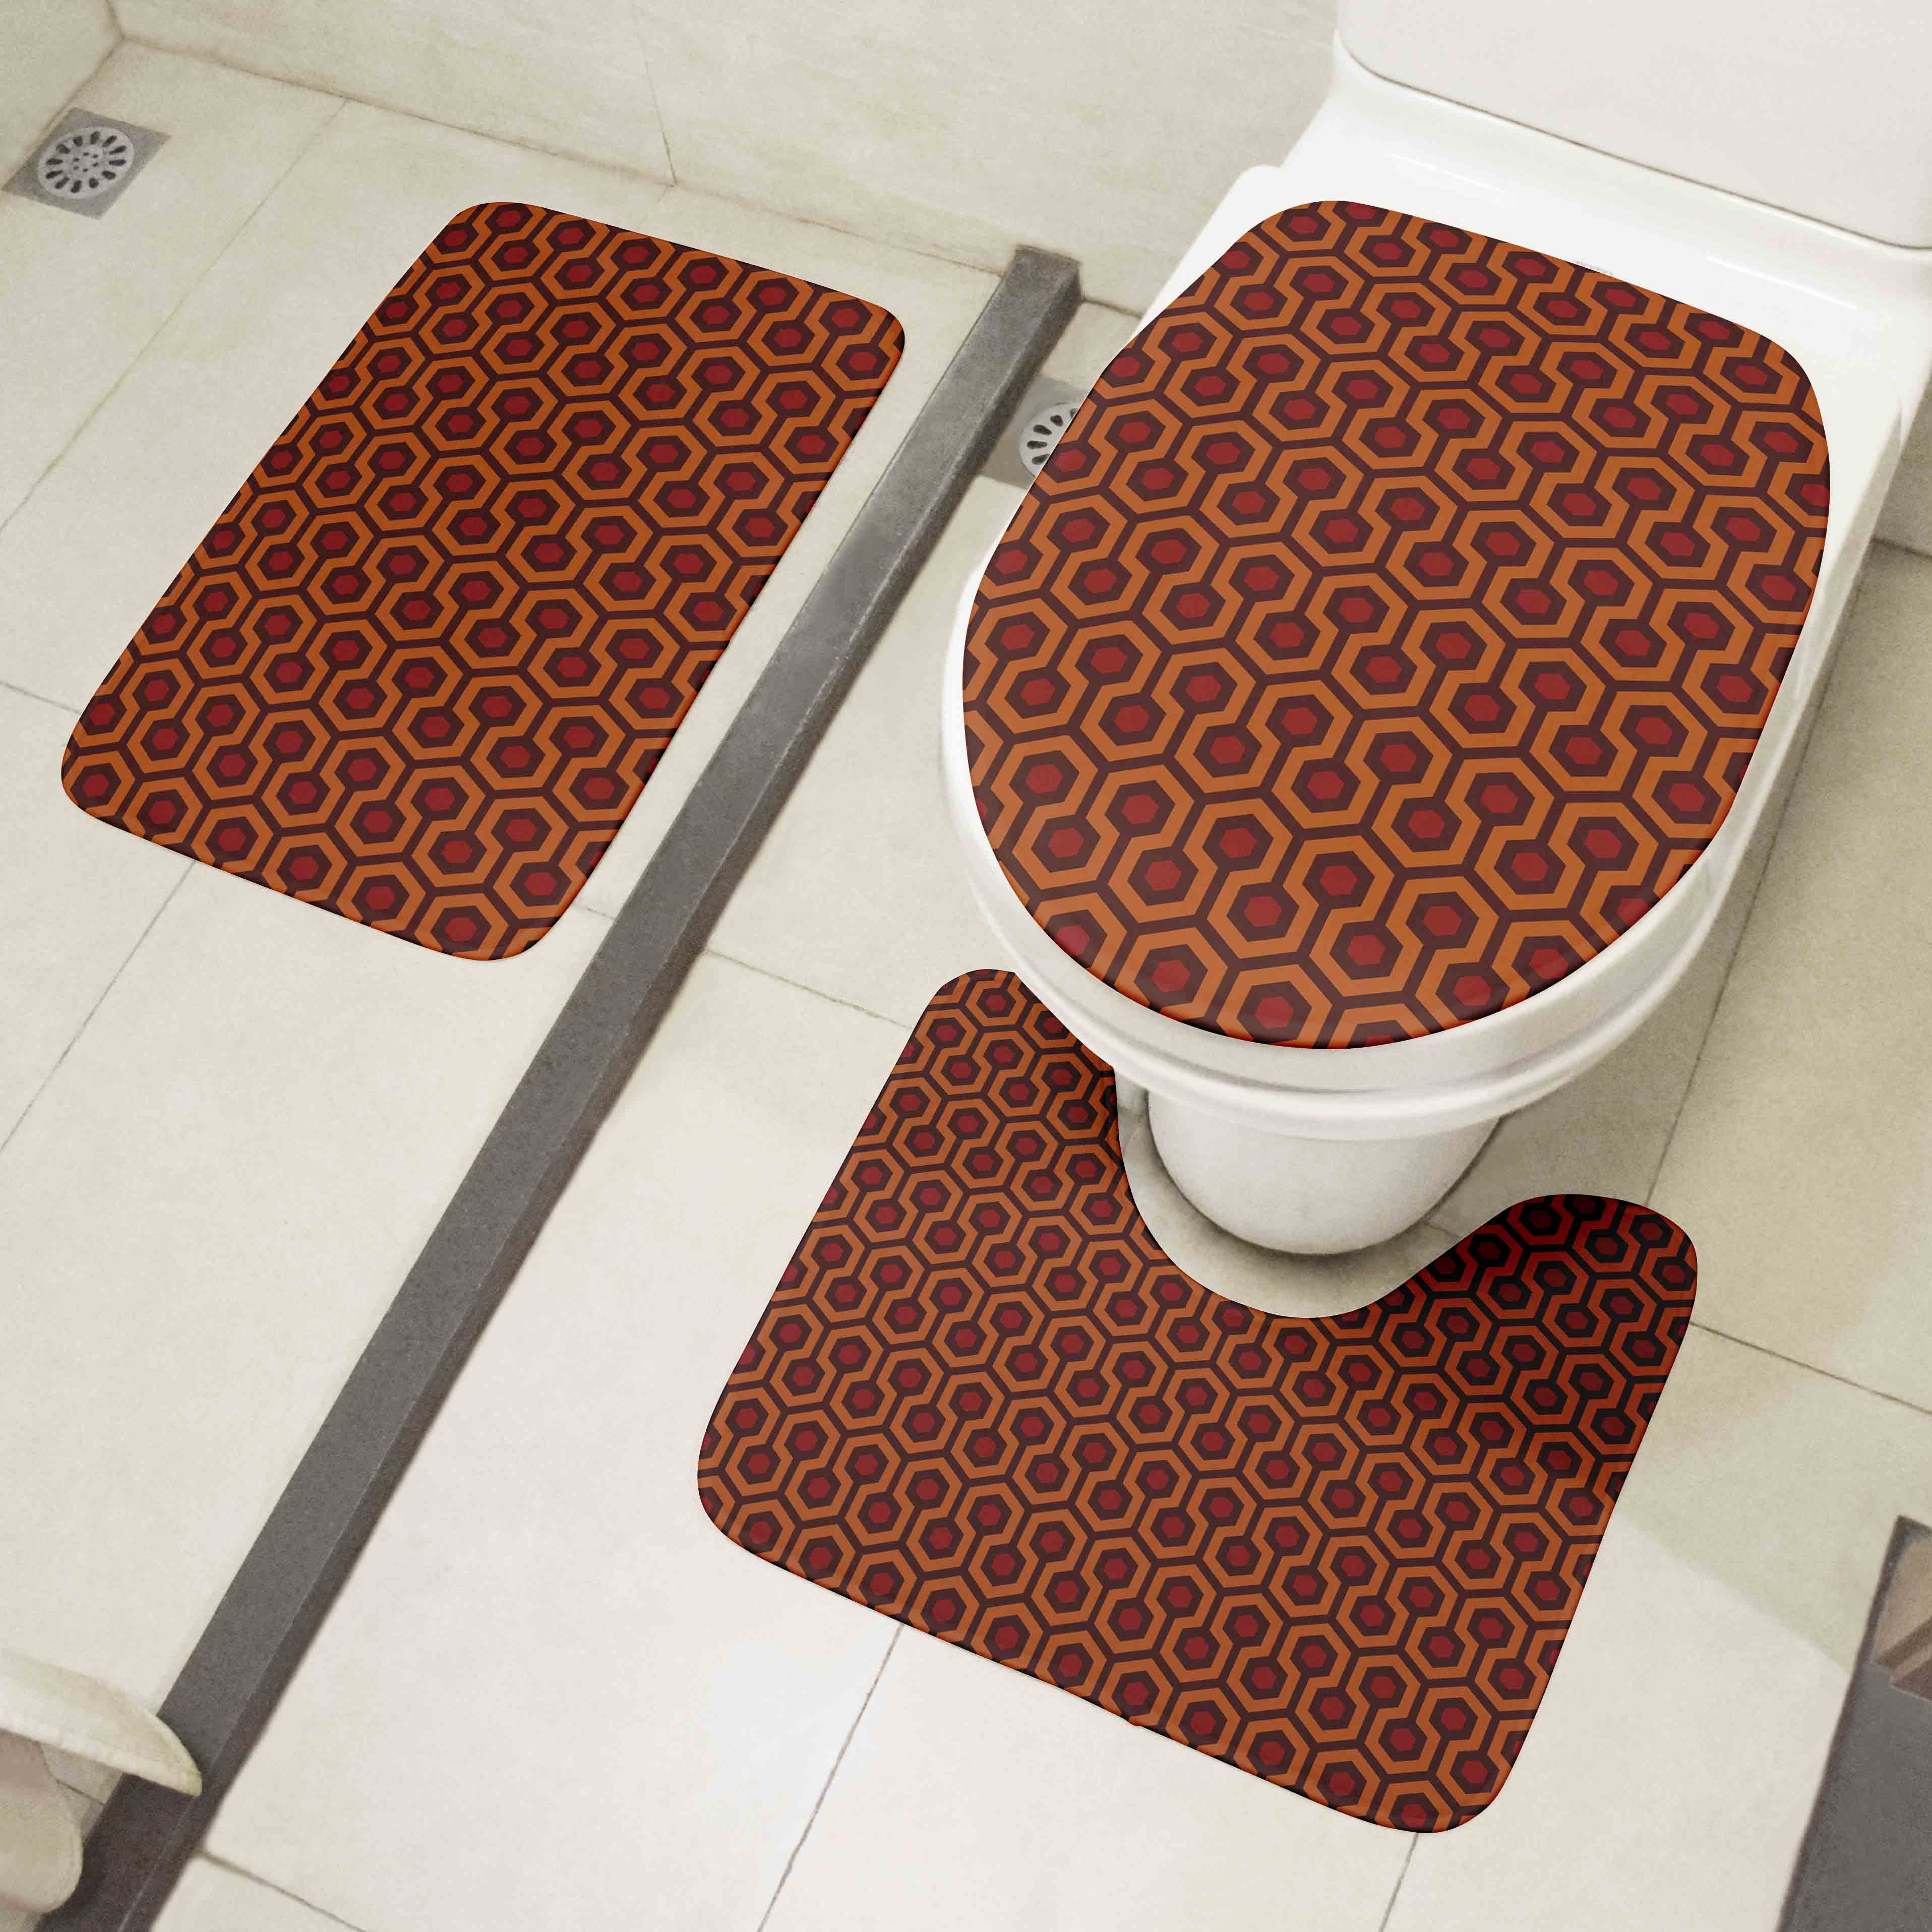 New 3D Printed Toilet Floor Mats 3 PCS Set Fun Alien Skull Toilet Cover Set Bathroom Decor Non-Slip Absorbent Rug Flannel Carpet